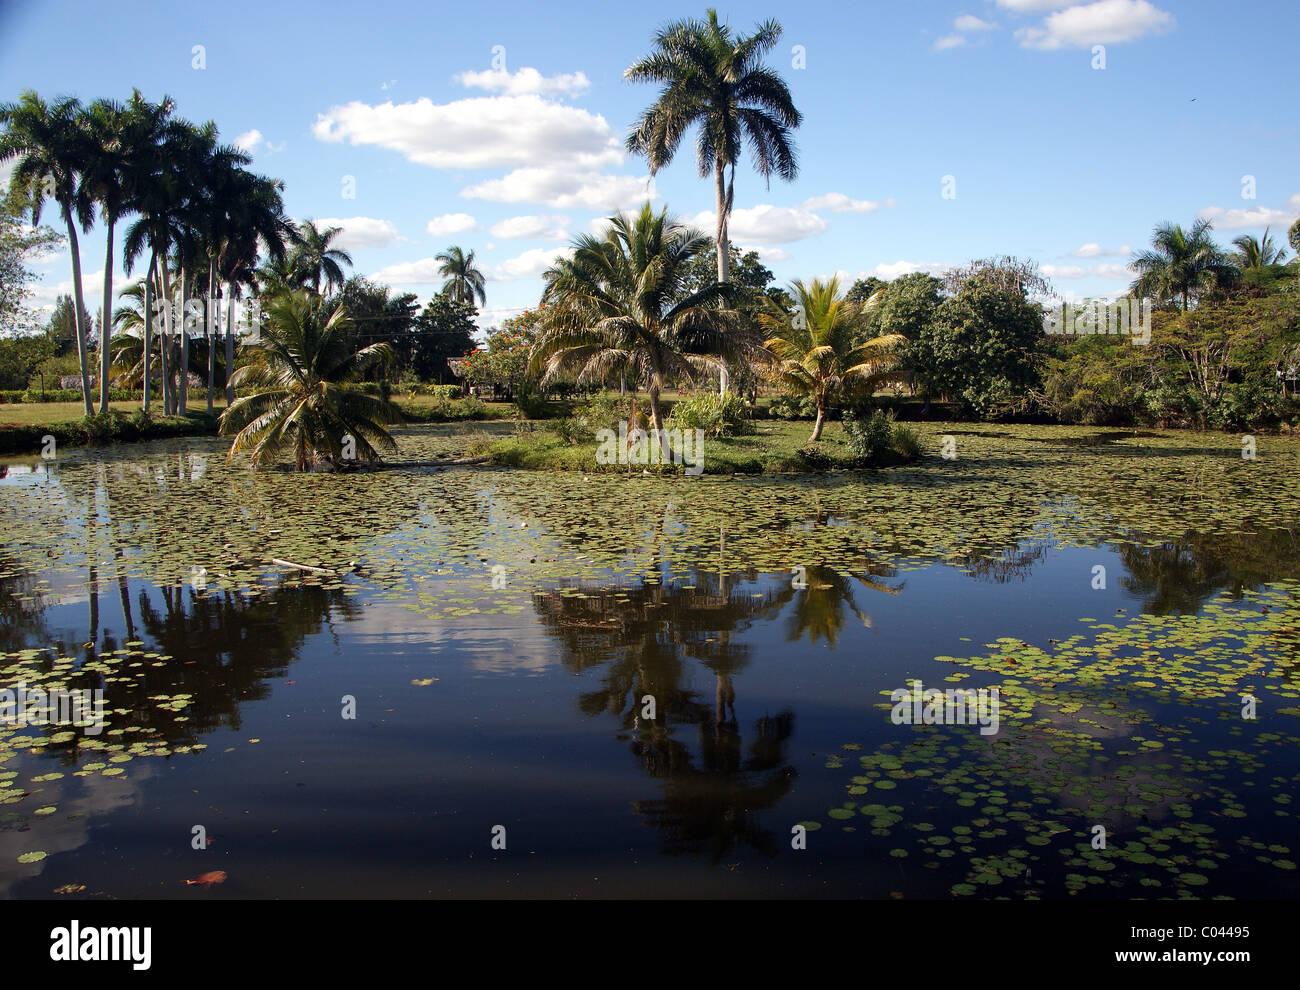 Crocodile farm cuba - Stock Image